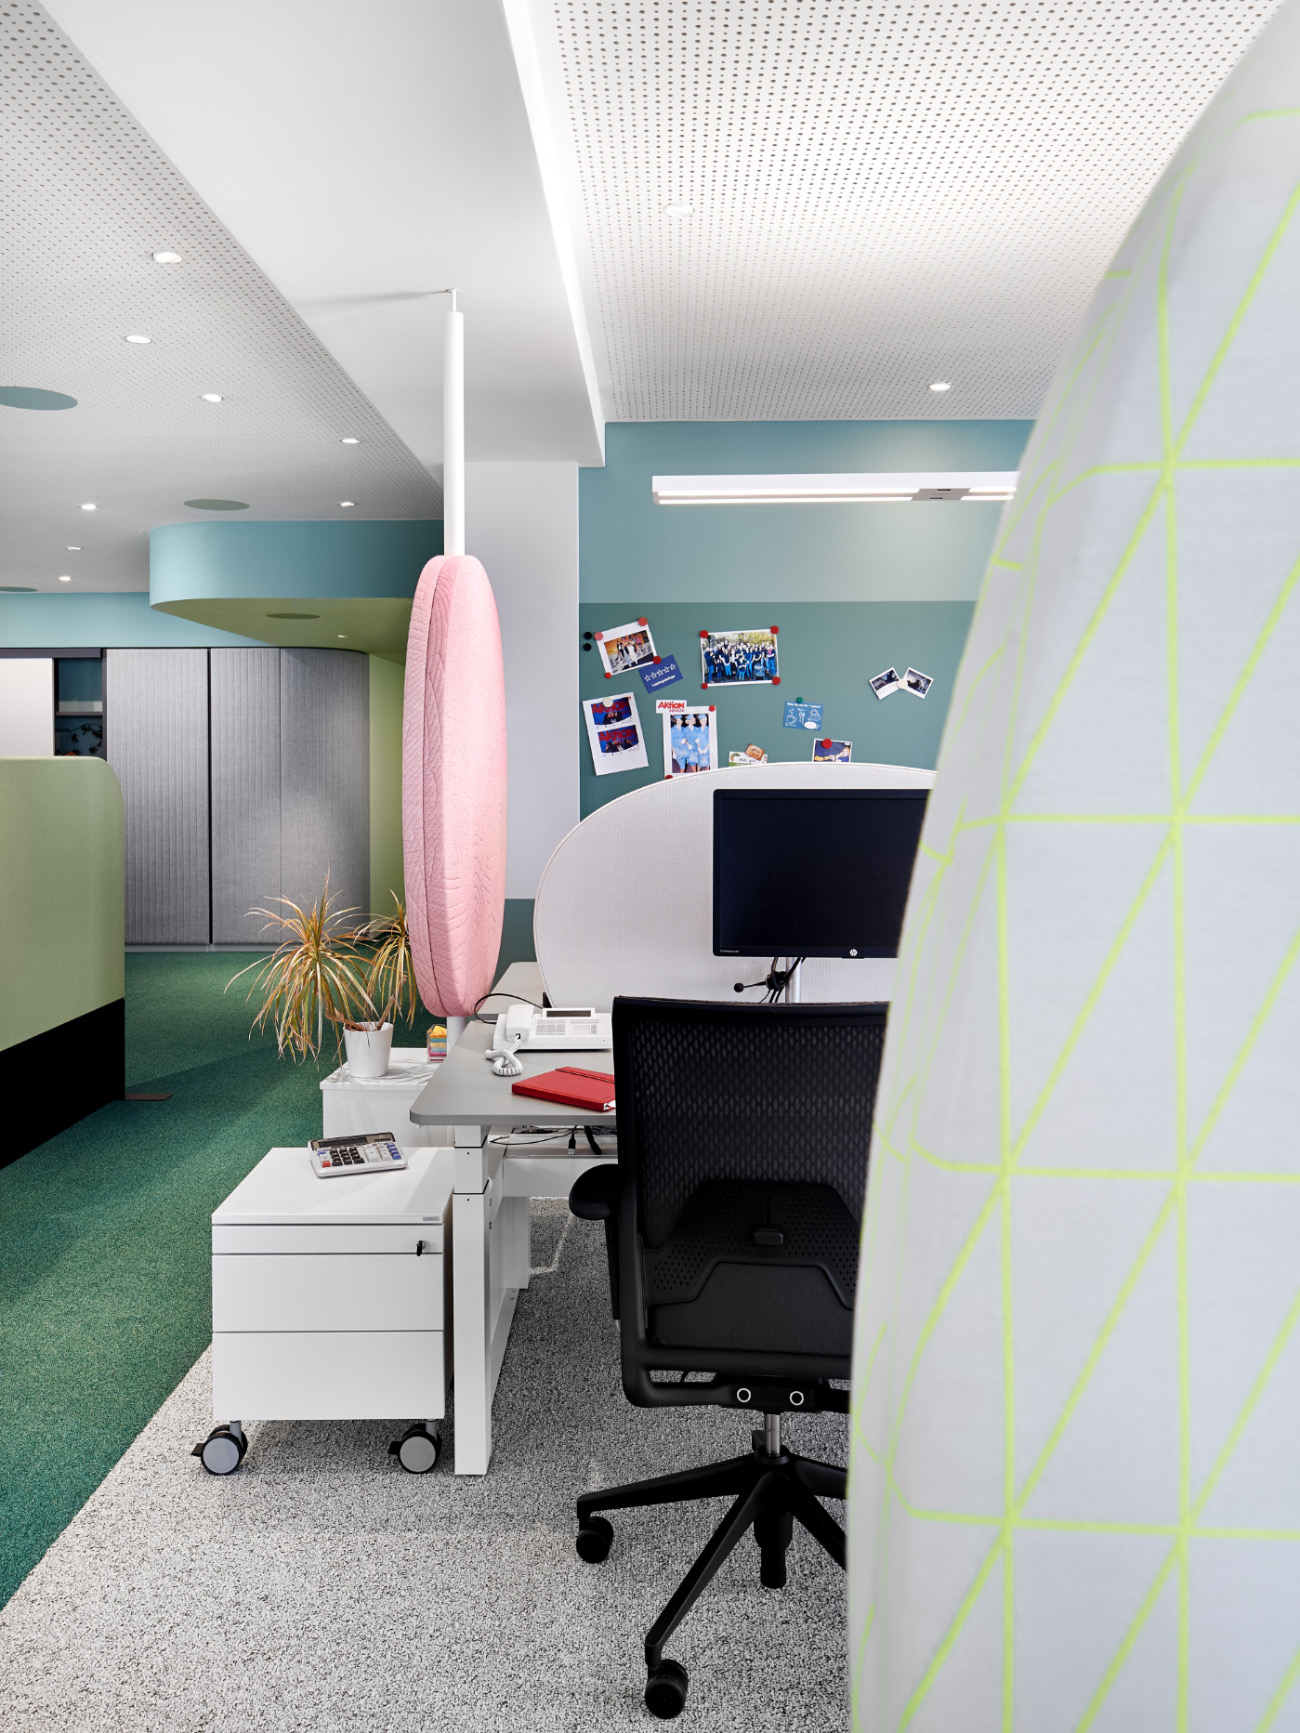 aktion-mensch-office-10